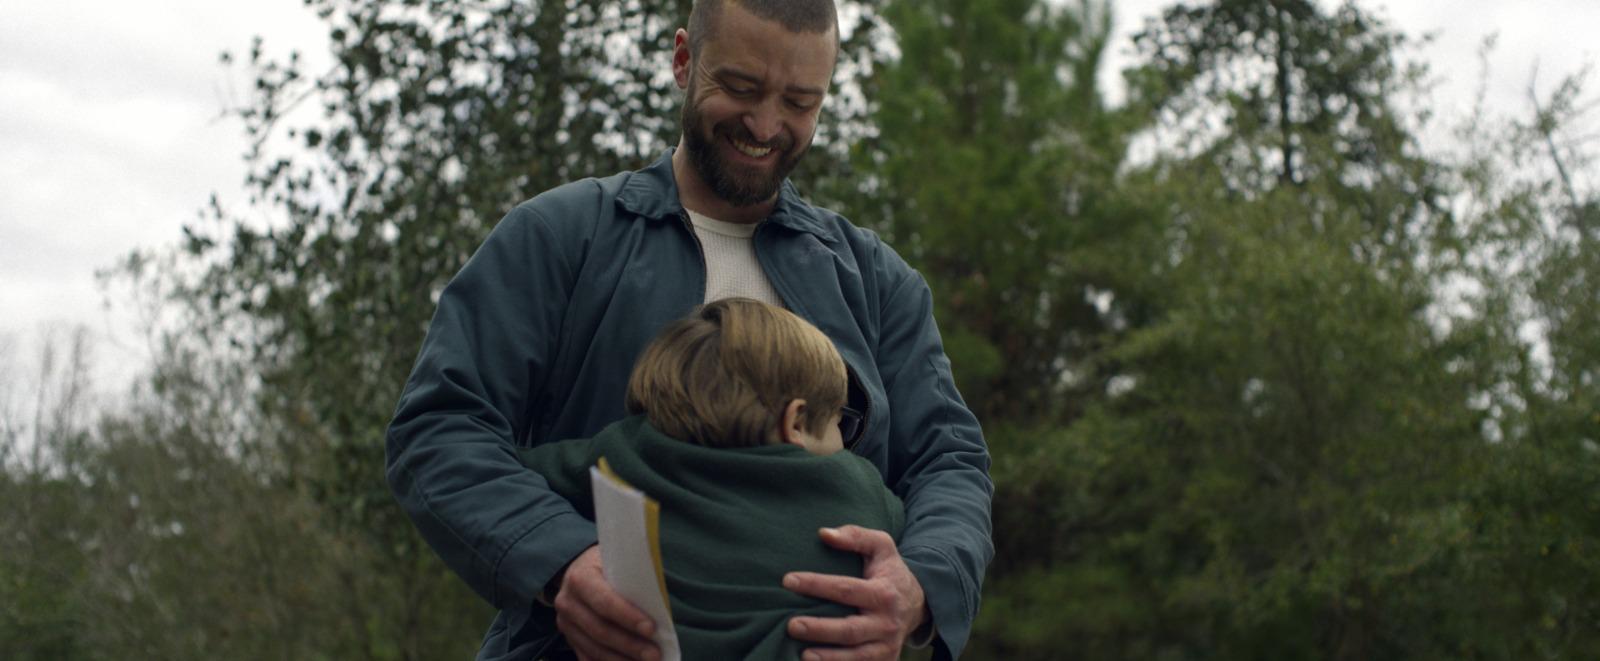 原創電影《 Palmer 》上線  Justin Timberlake 破格演繹重囚人生